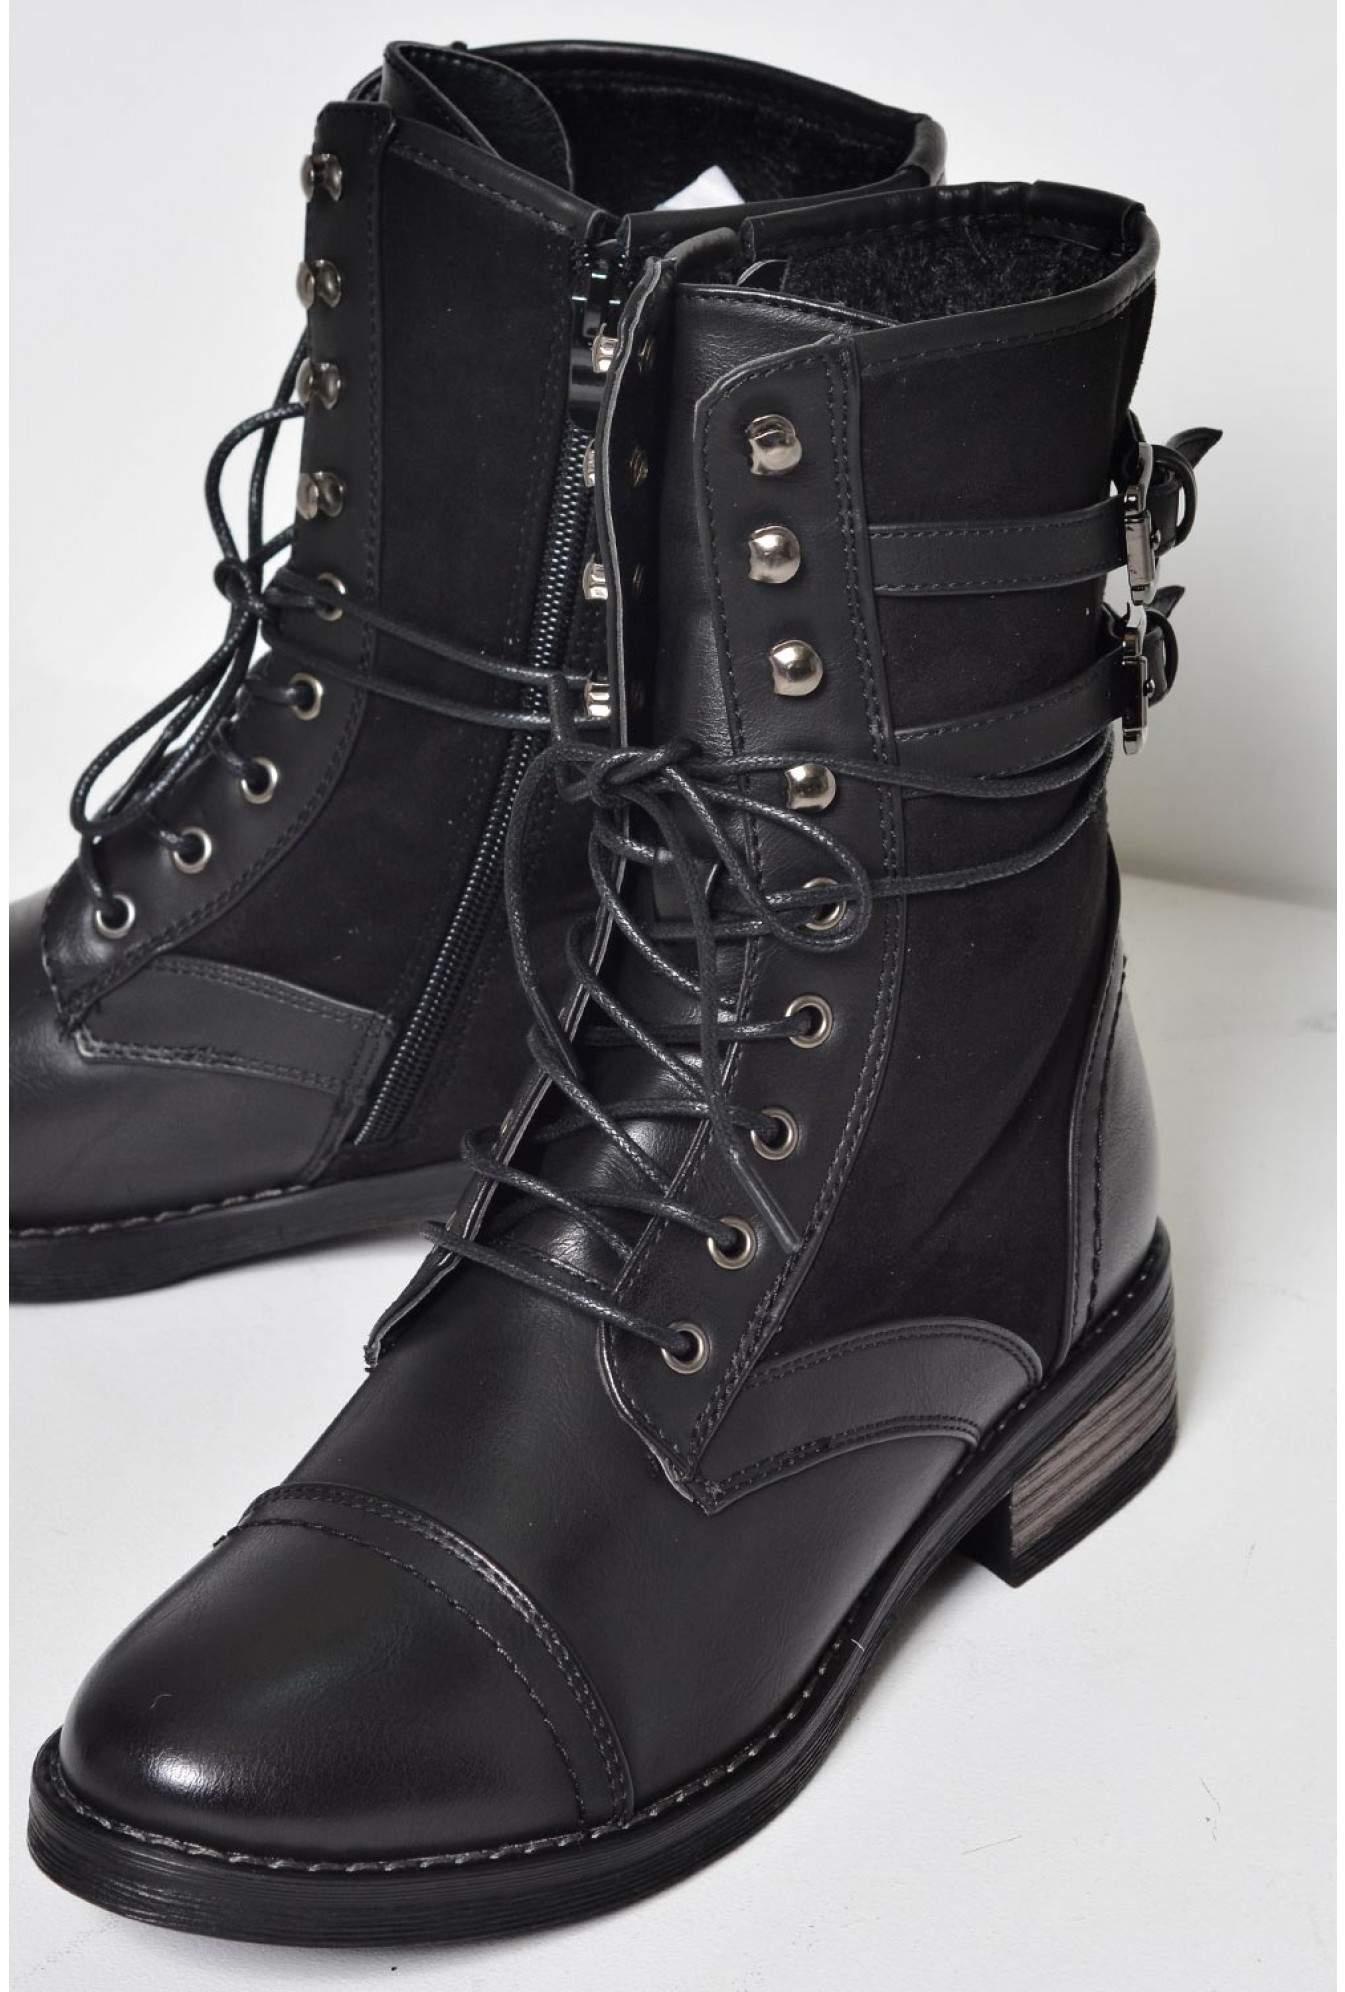 d536c946331 Kat Lace Up Buckle Boots in Black